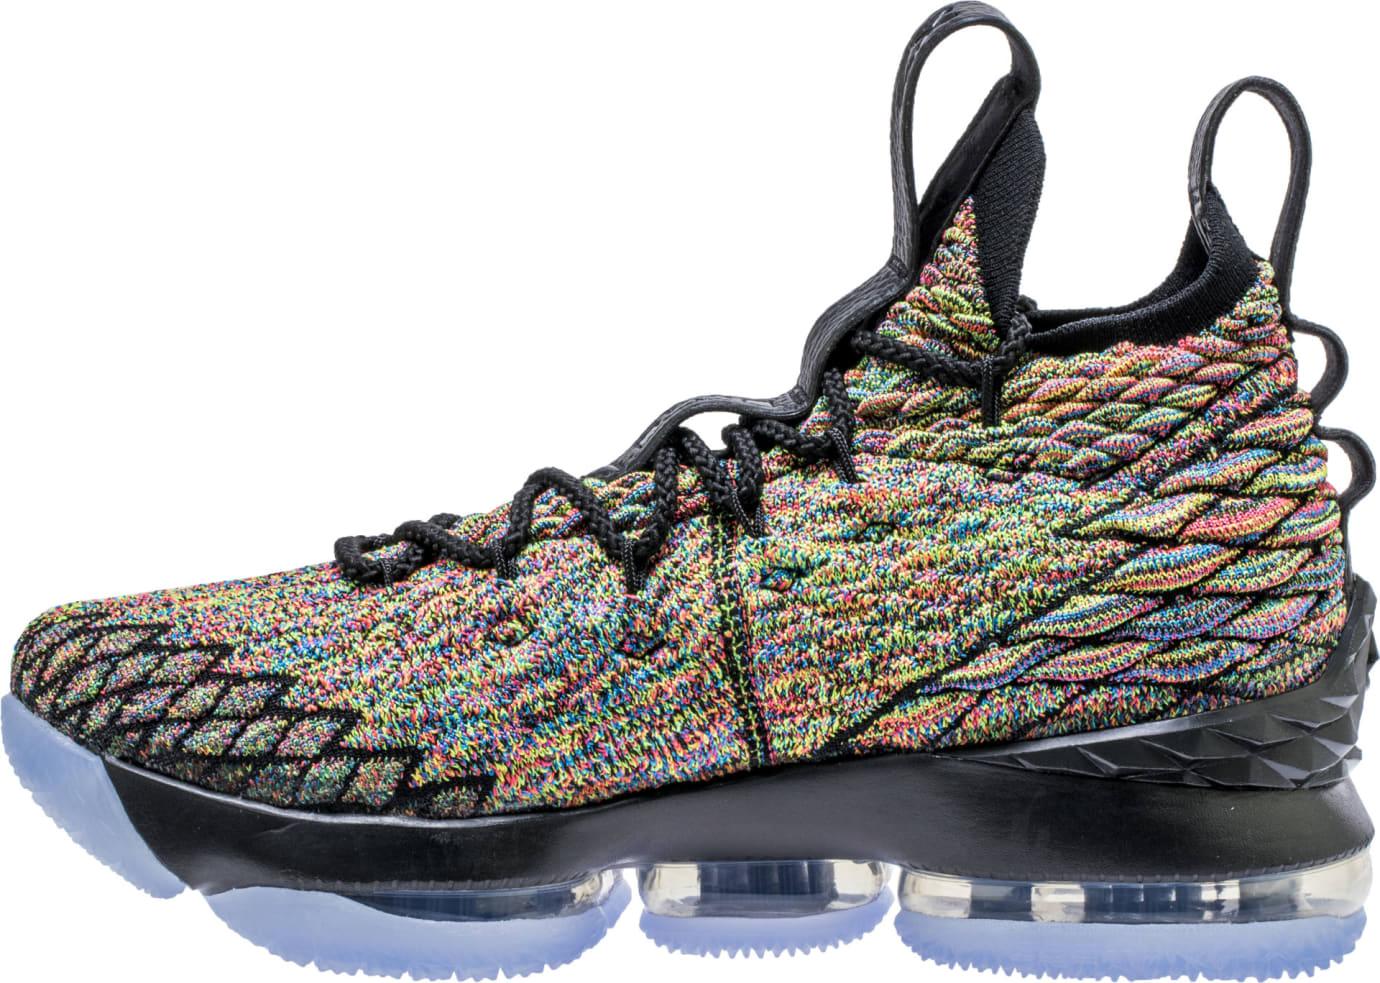 f786422361a Nike LeBron 15 Black Four Horsemen Release Date 897648-901